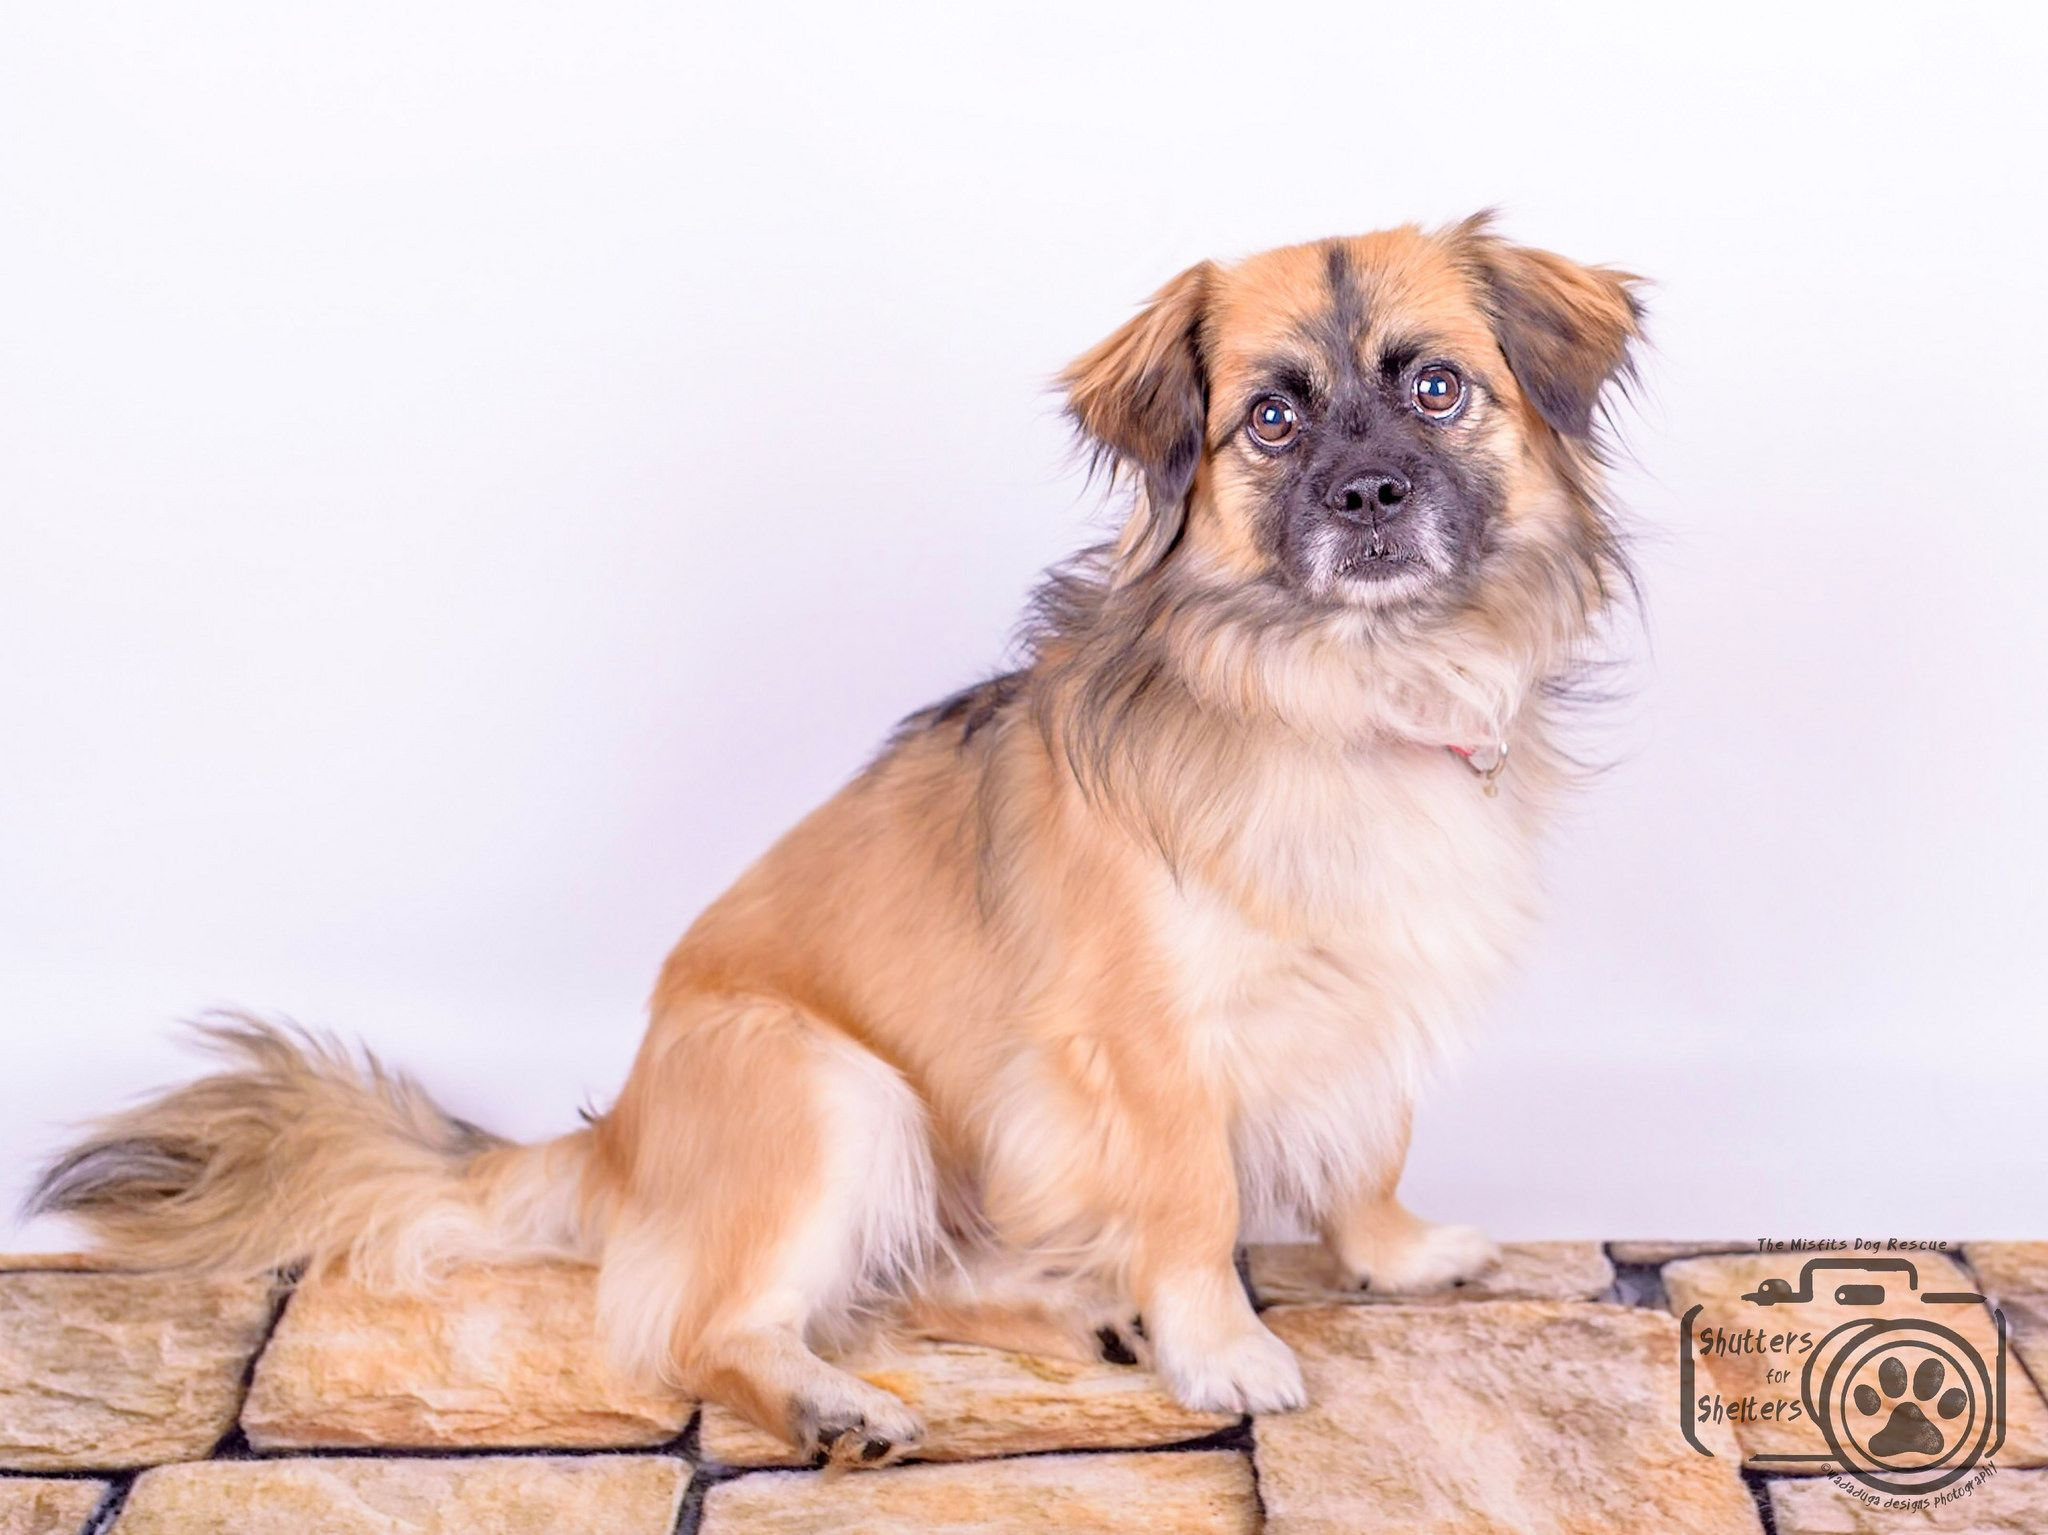 Tibetan Spaniel Dog For Adoption In Colorado Springs Co Adn 817927 On Puppyfinder Com Gender Male Age Y Dog Adoption Tibetan Spaniel Spaniel Dog